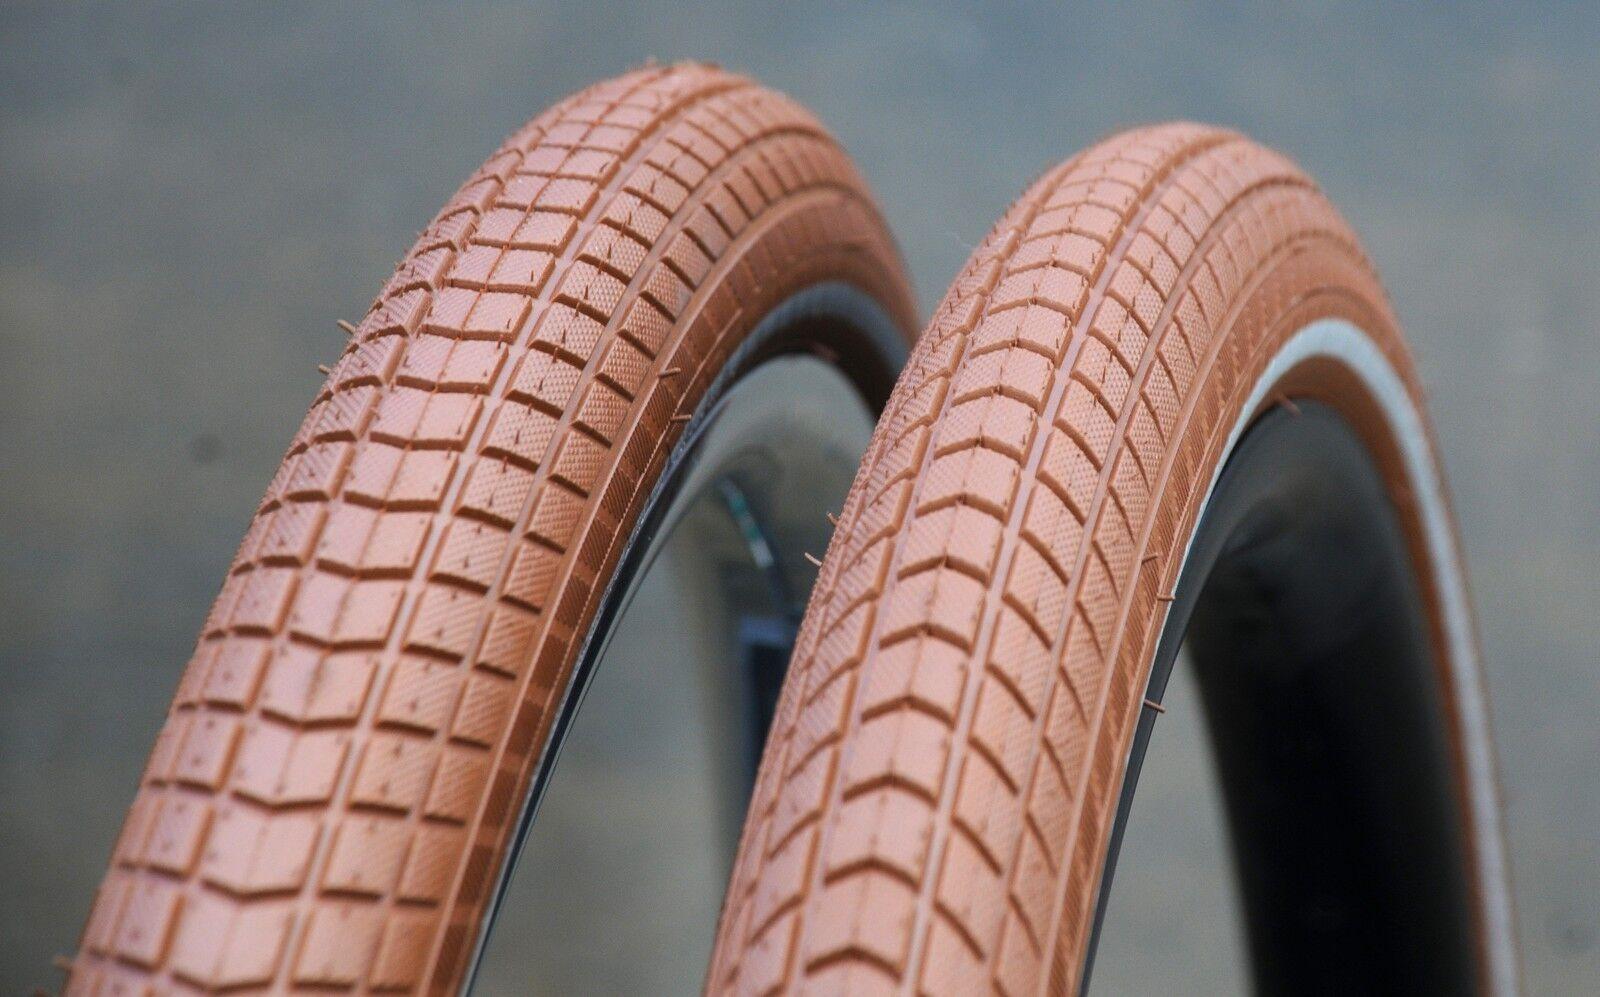 700x38 Antique Red   Brown 29er Schwalbe  LBB Bicycle Tires 28  Wood Wheel Bike  hot